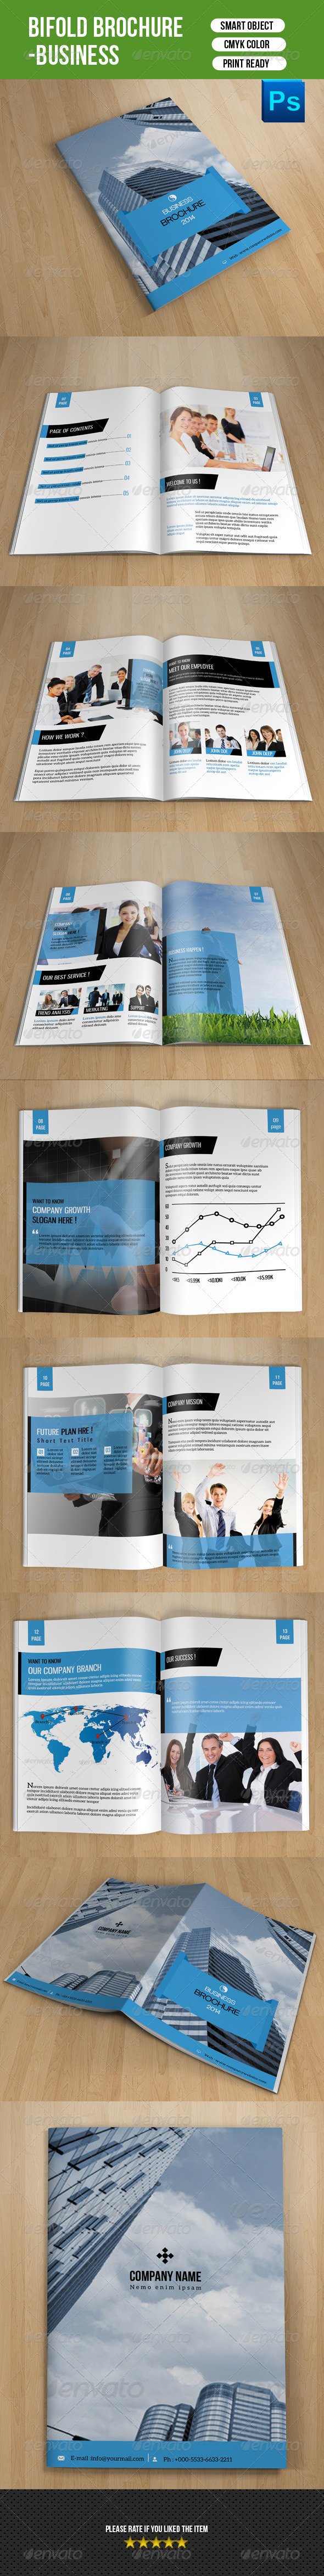 Bifold Business Brochure-V58 - Corporate Brochures